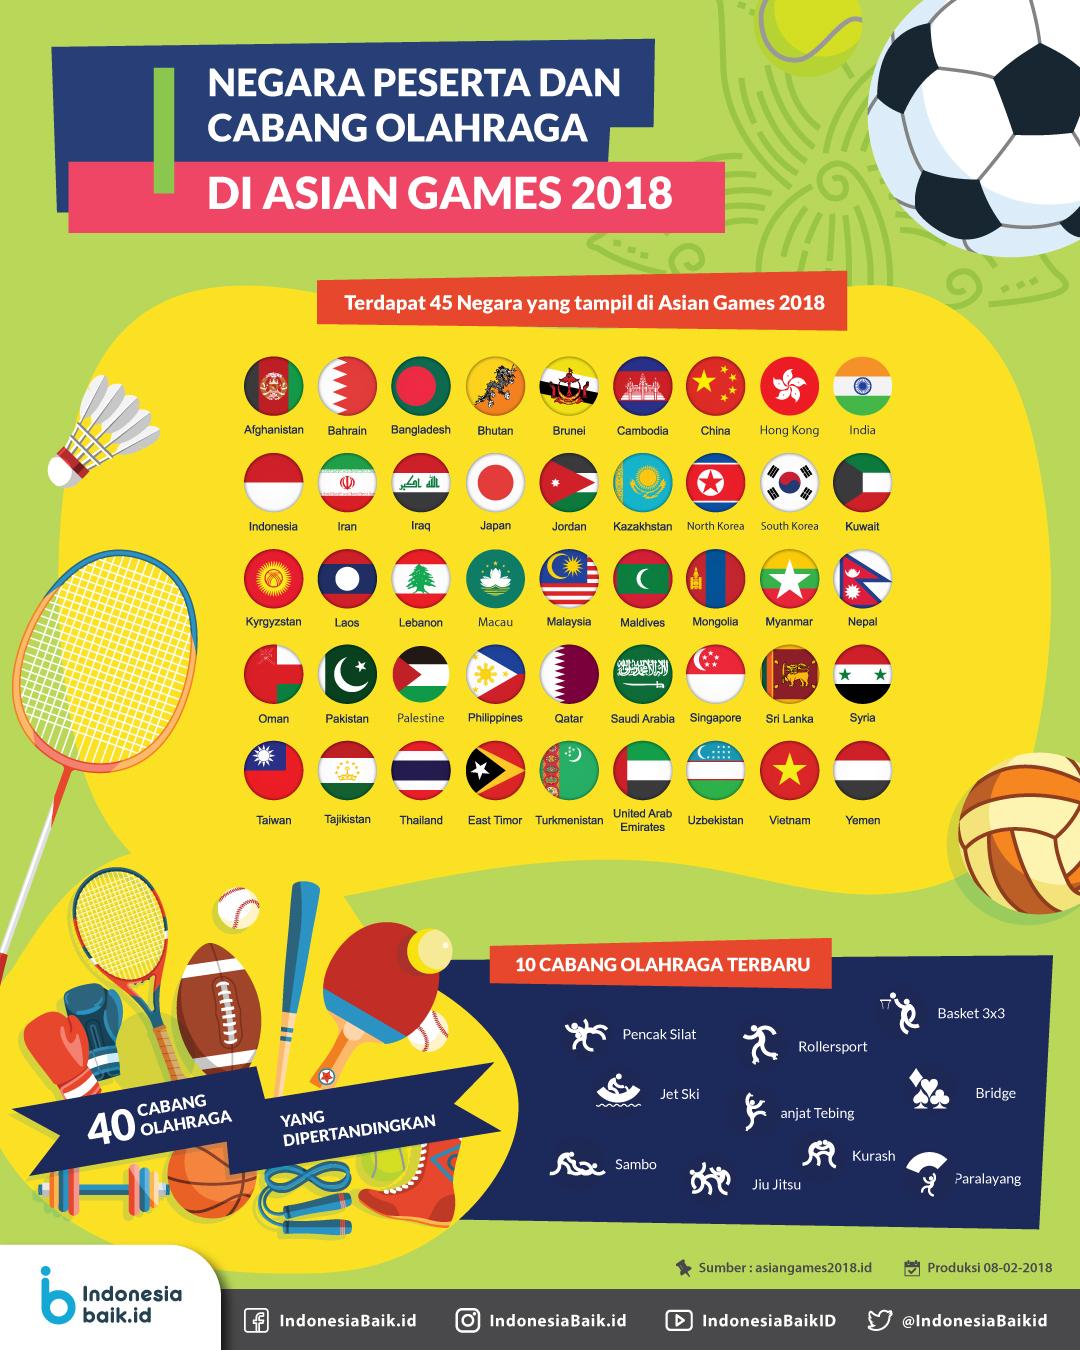 VII 2aweb - Asian Games 2018 Di Negara